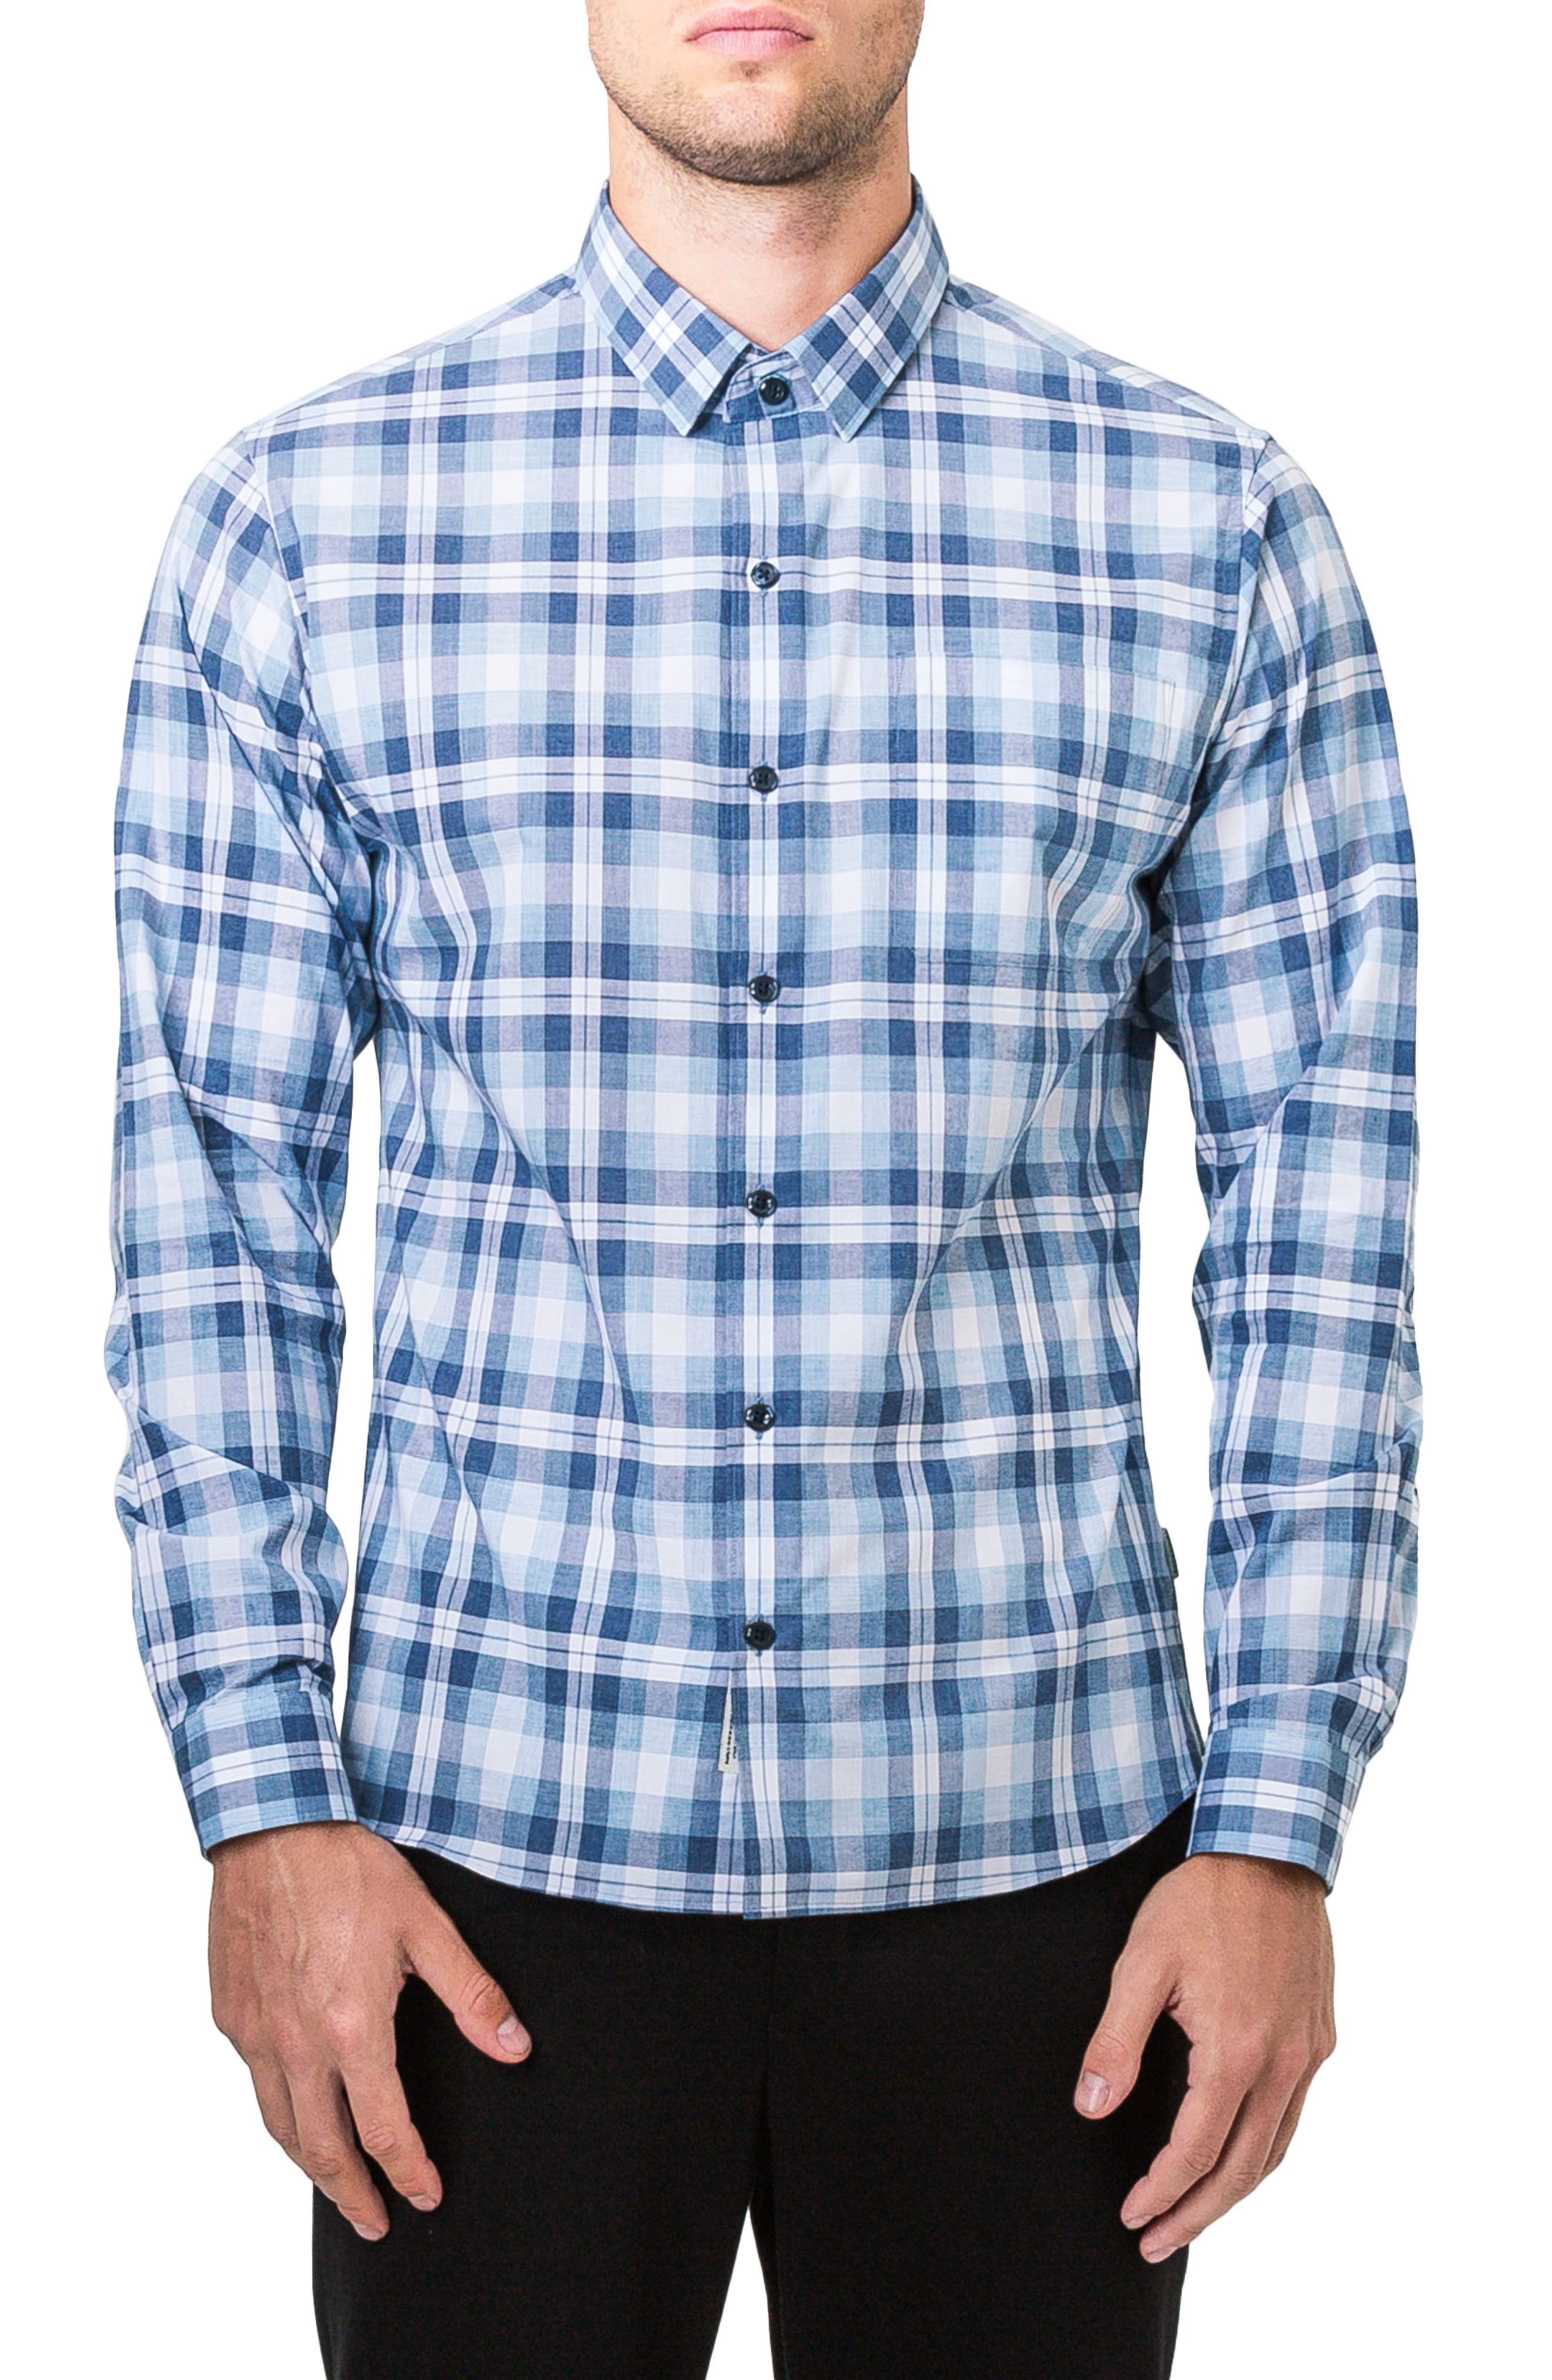 Morning Rain Woven Shirt,                         Main,                         color, Blue